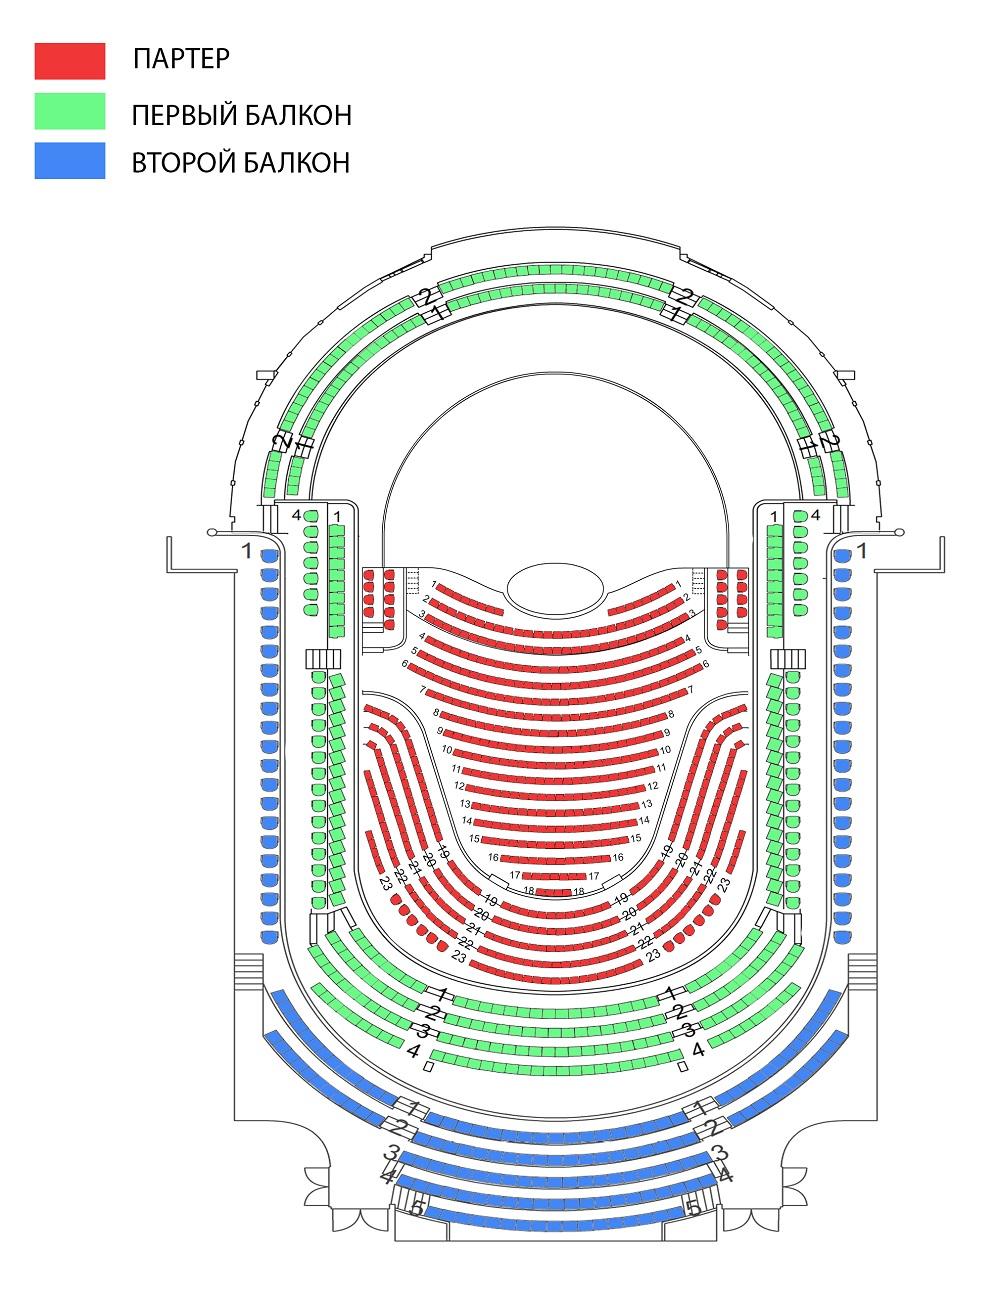 Фестиваль Сибелиуса в Лахти. Схема зала Sibelius Hall